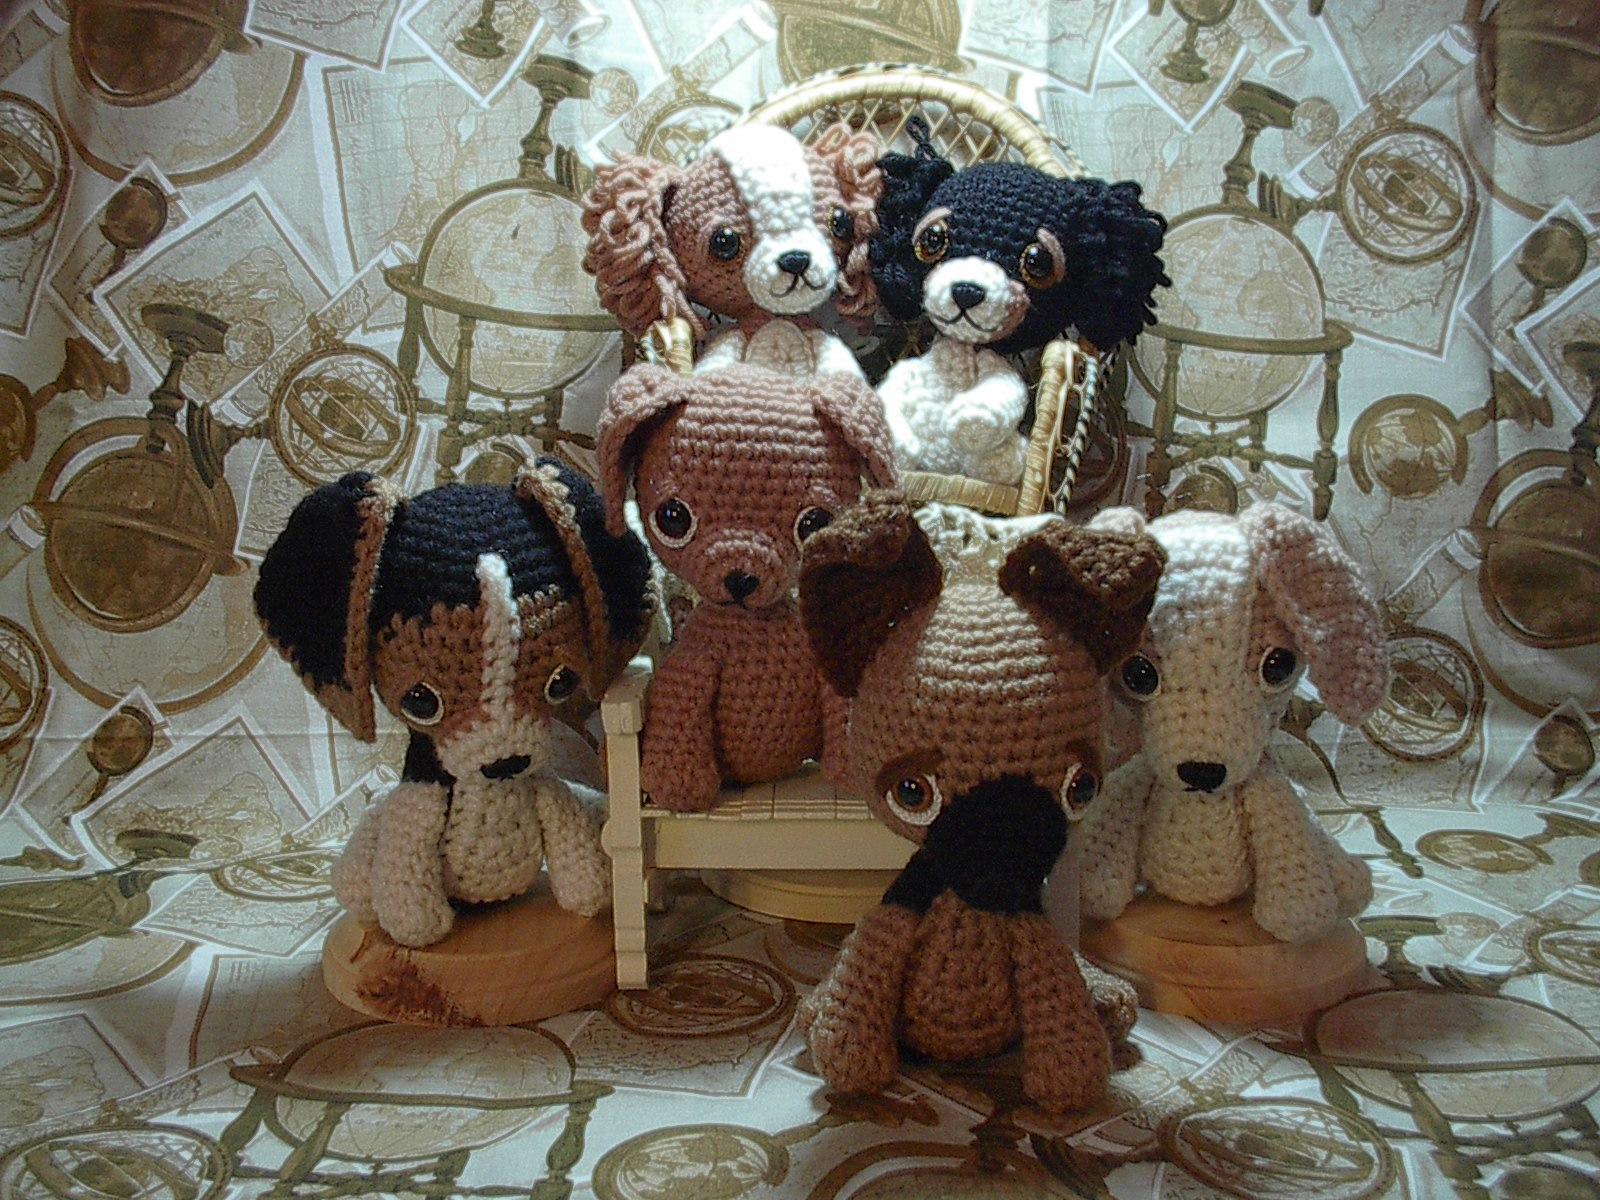 Crochet Labrador: How To Make Your Own Toy Dog - The Labrador Site | 1200x1600